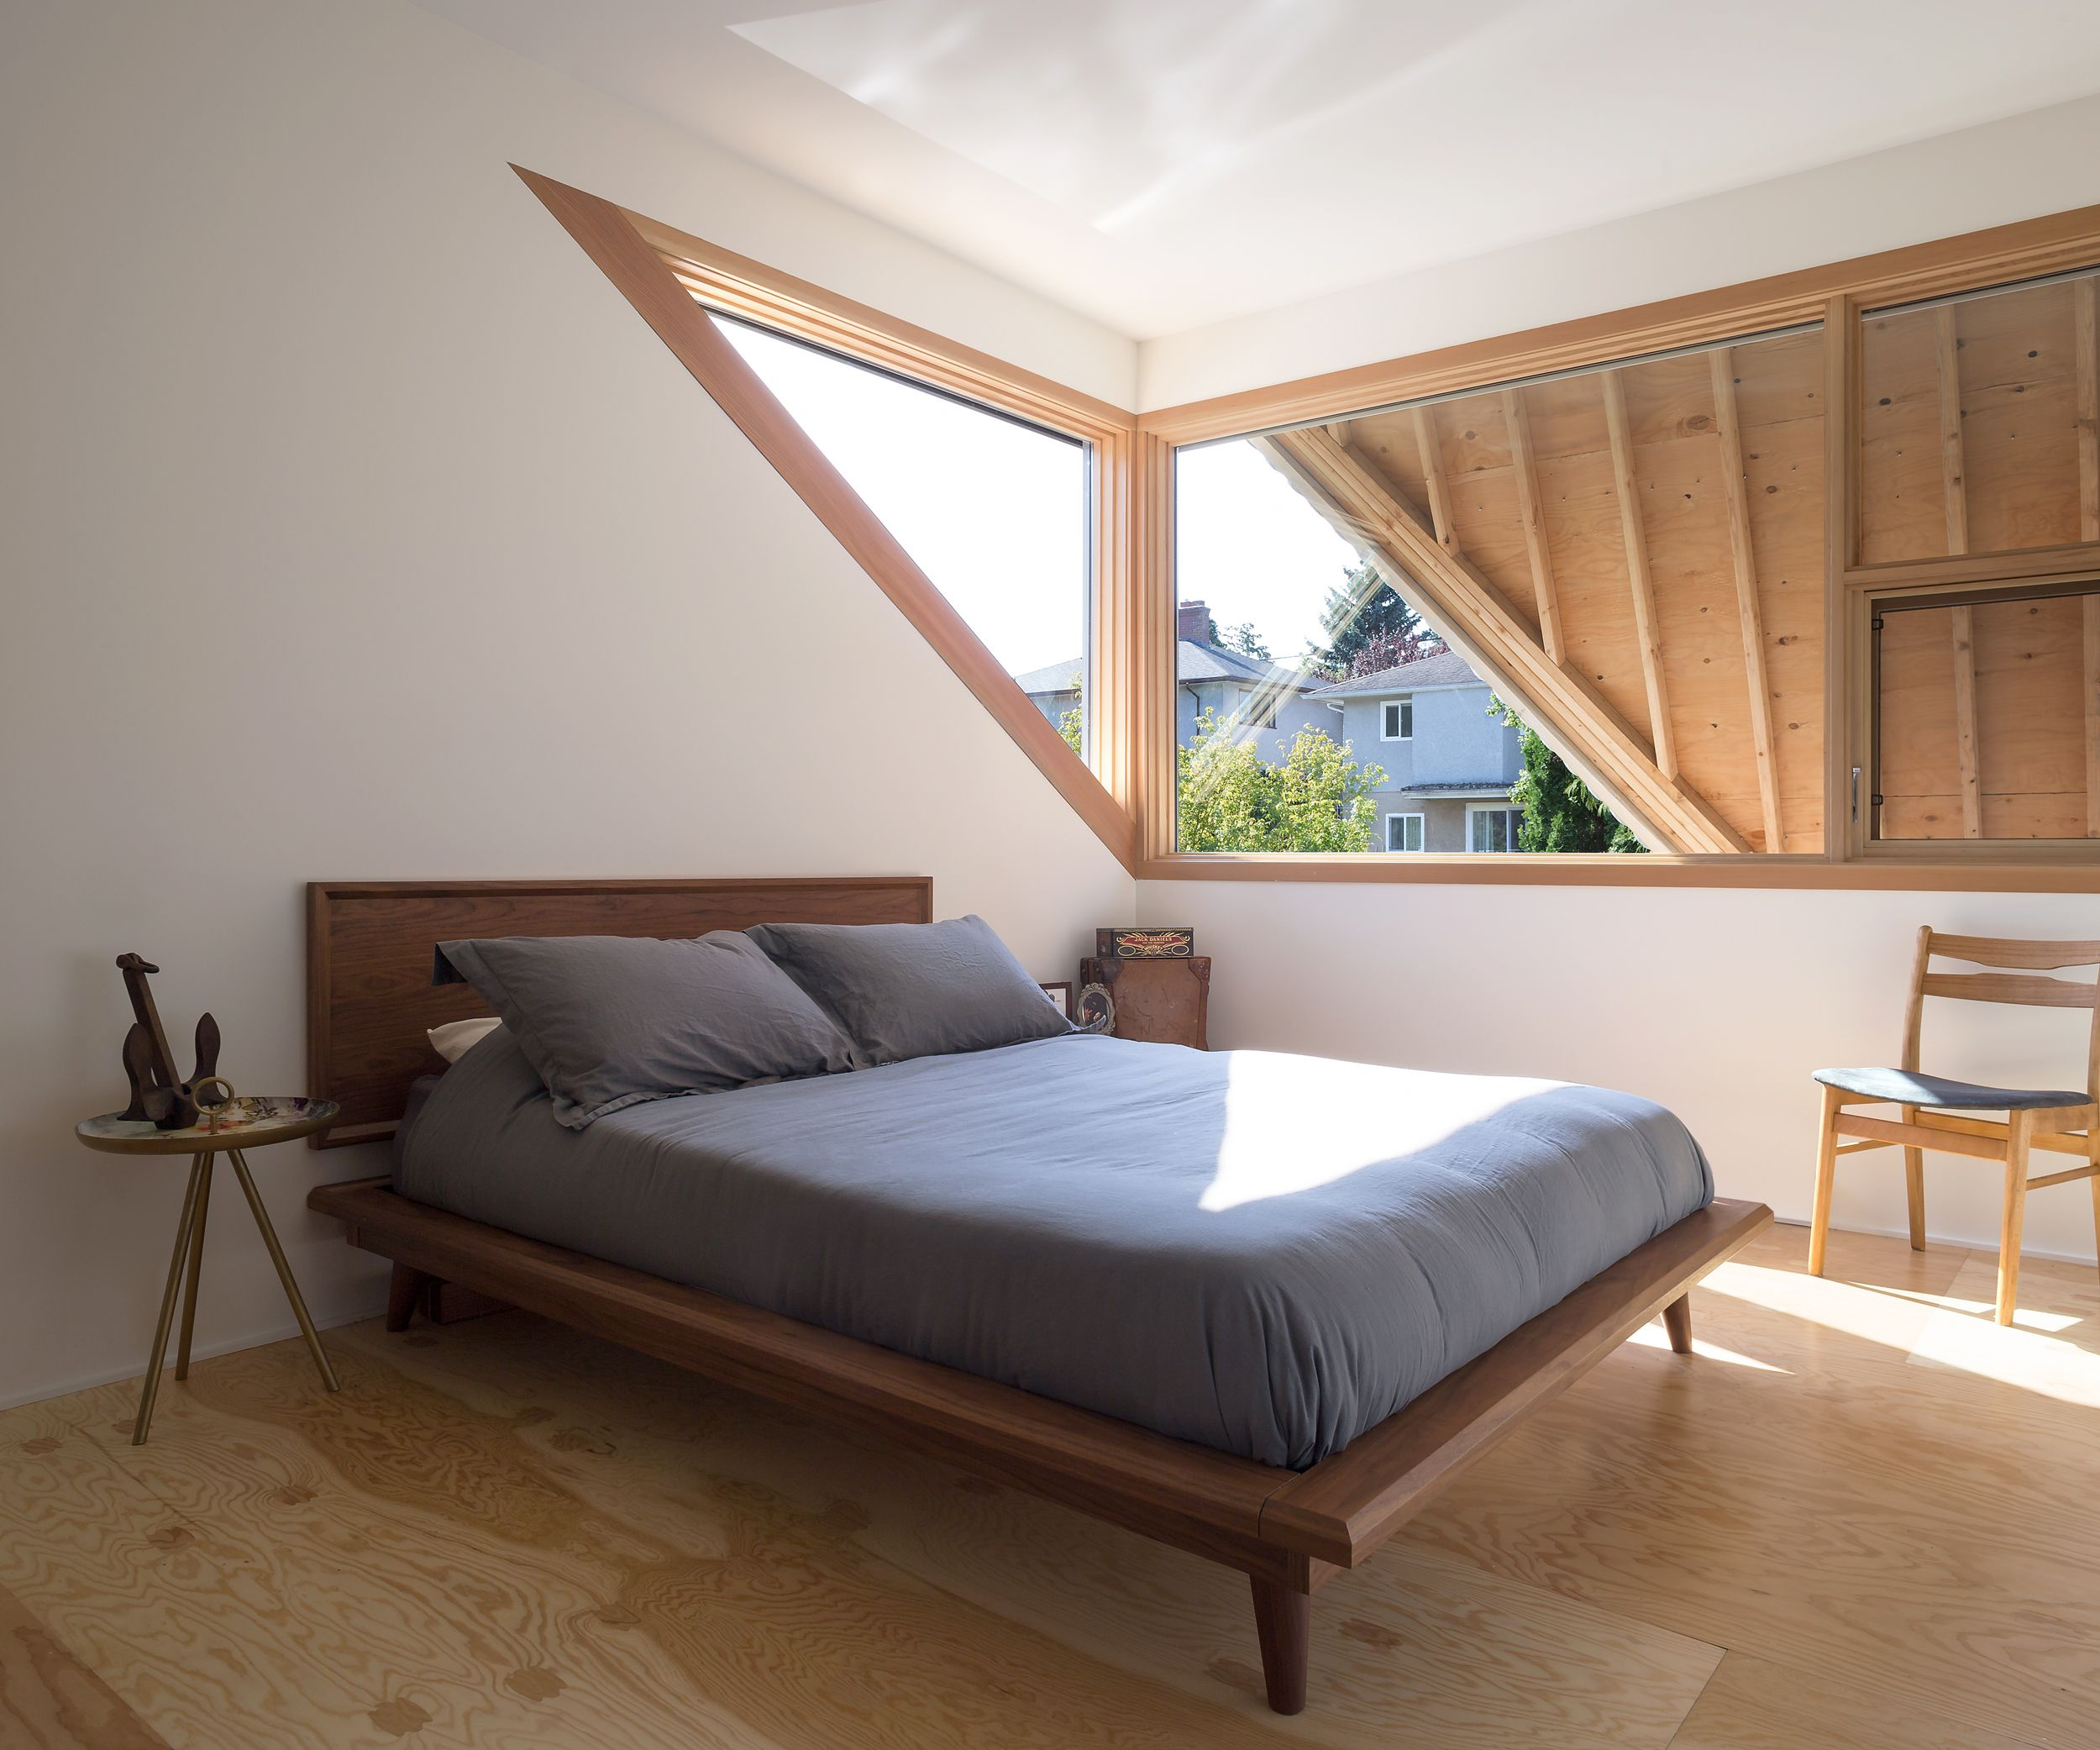 DoubleHeader_Bedroom.jpg